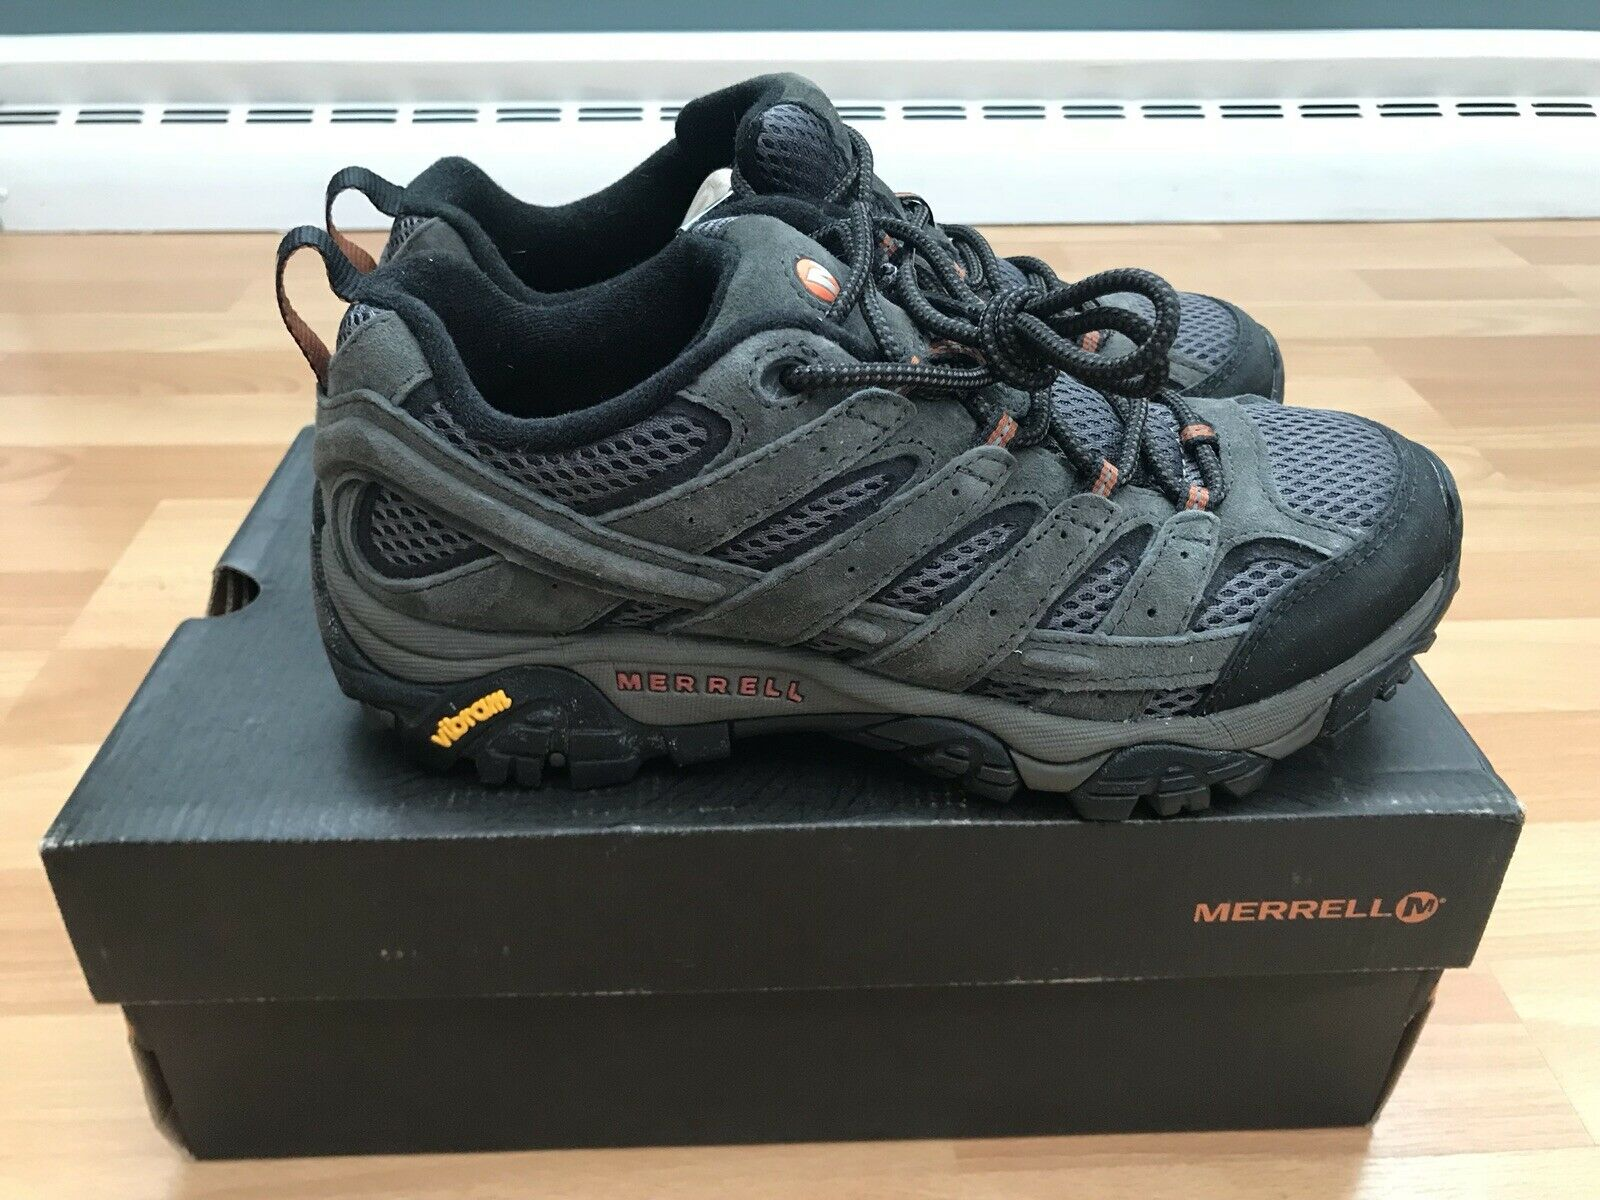 NWIB Merrell Men's Moab 2 Vent Hiking shoes, Beluga, (Size 7 M)